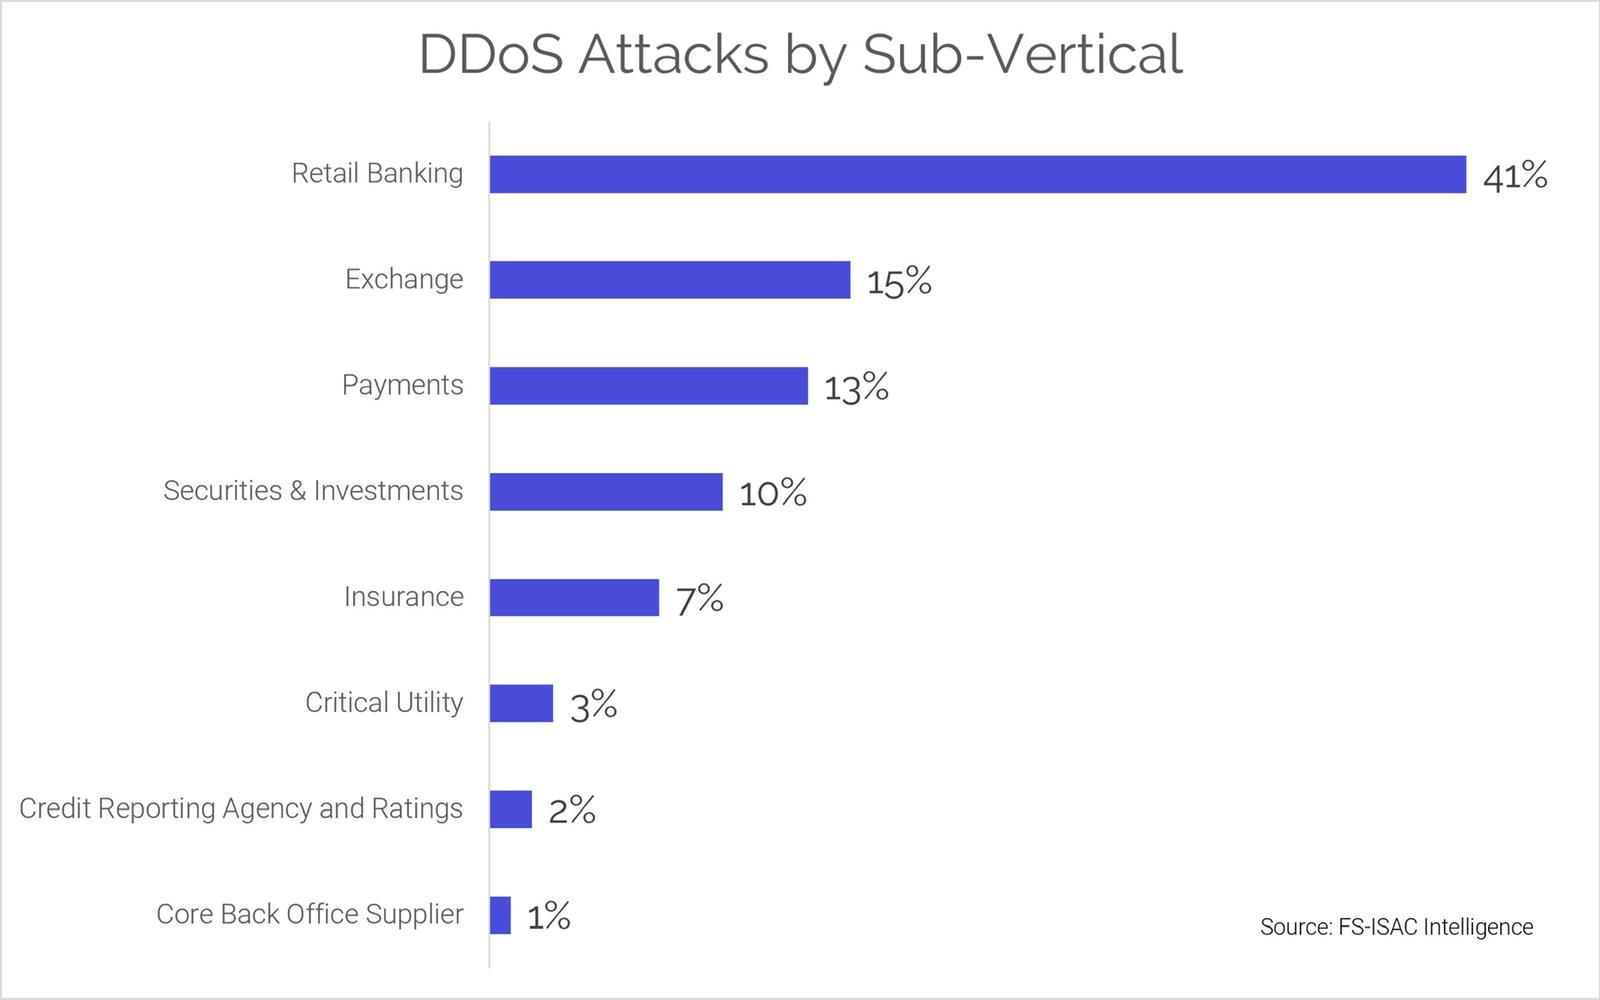 DDoS subvertical